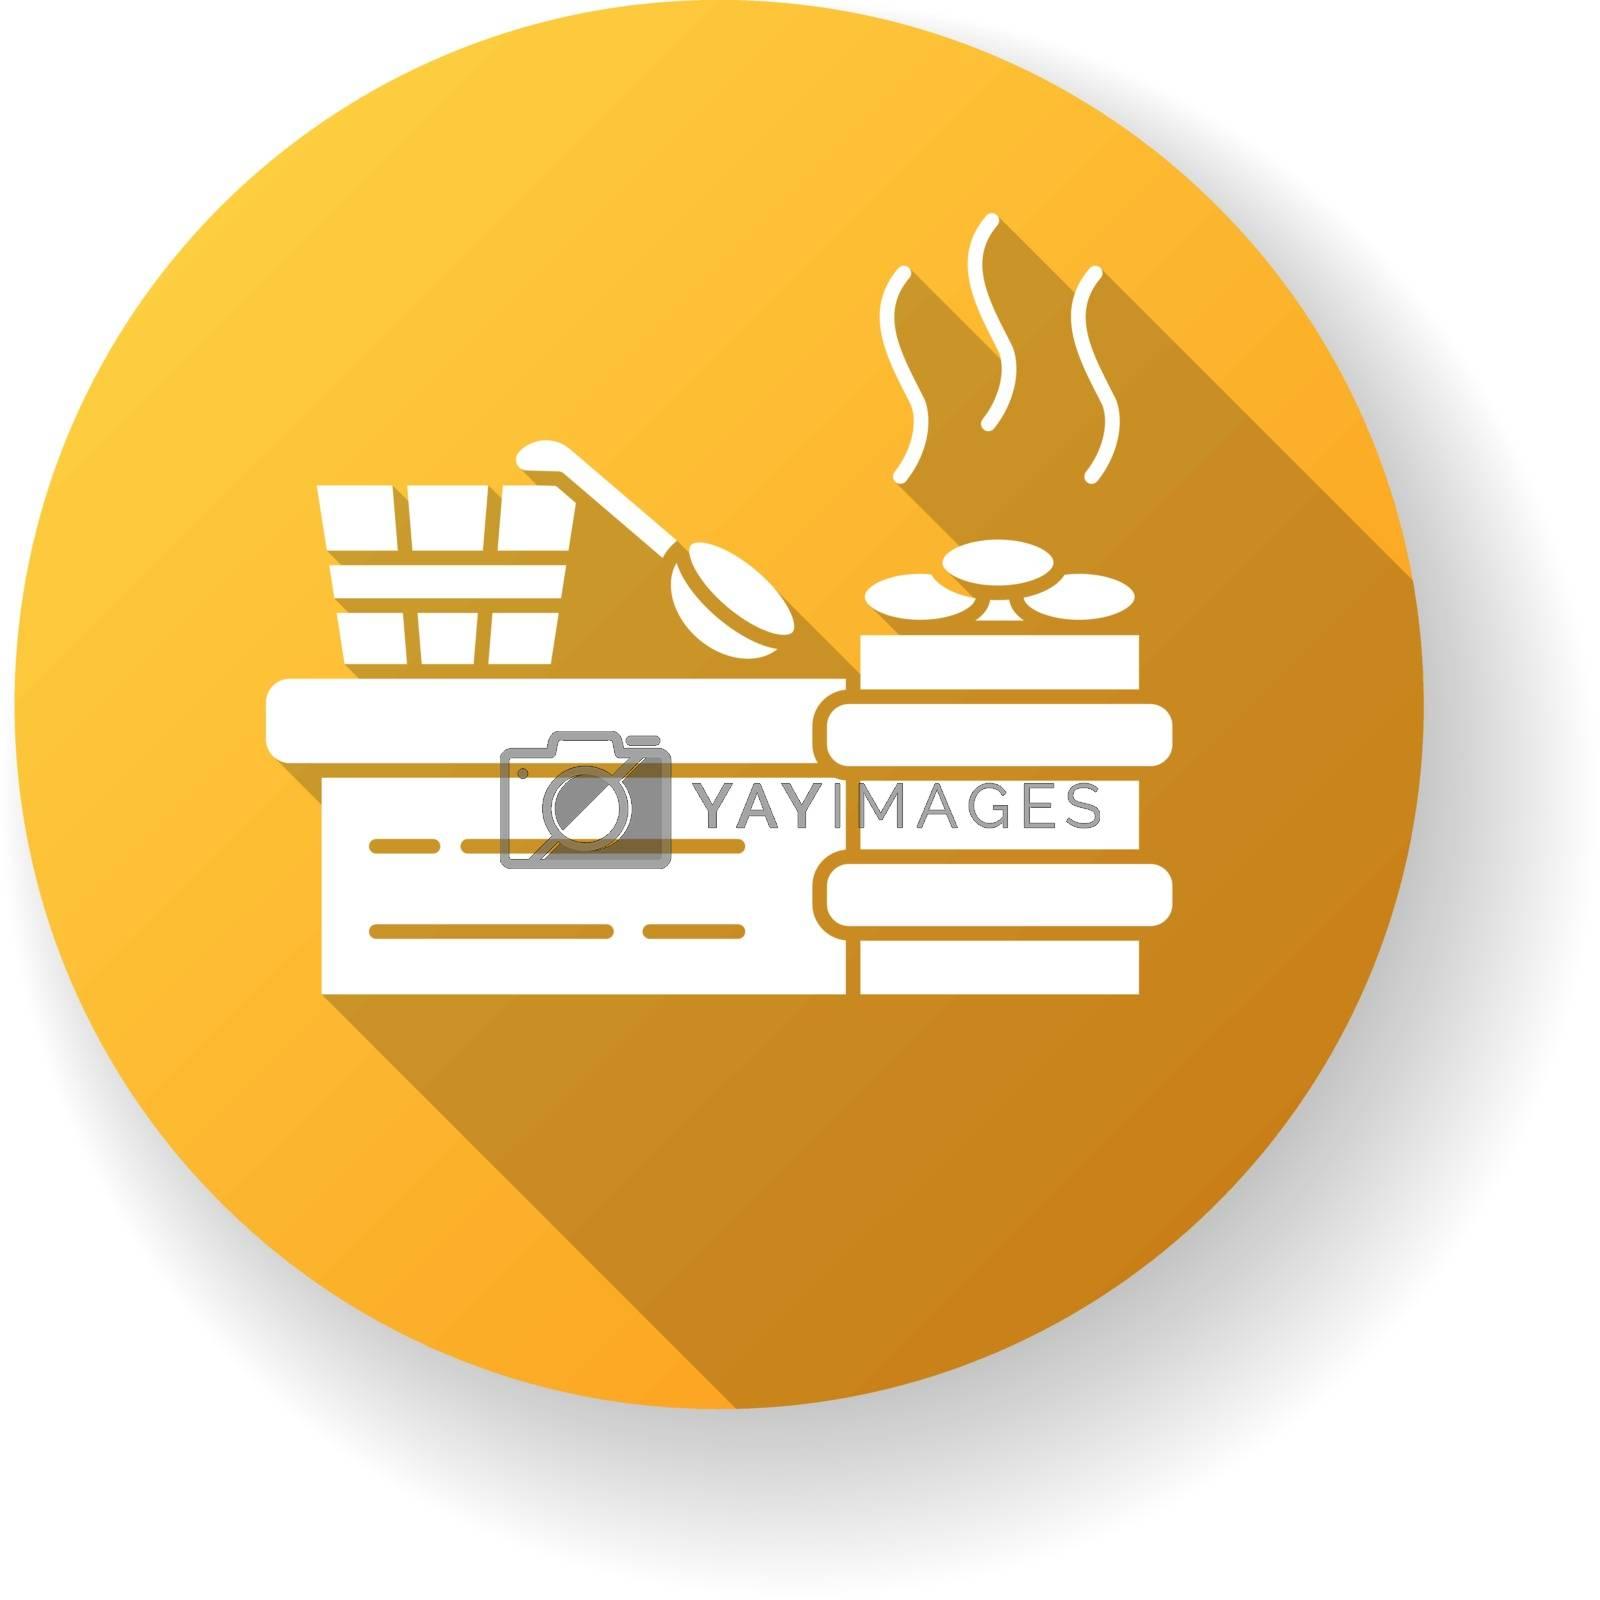 Steam room yellow flat design long shadow glyph icon. Sauna recreation, vaporarium. Steam bath, bathhouse accessories. Water bucket, wooden spoon and heated stones silhouette RGB color illustration